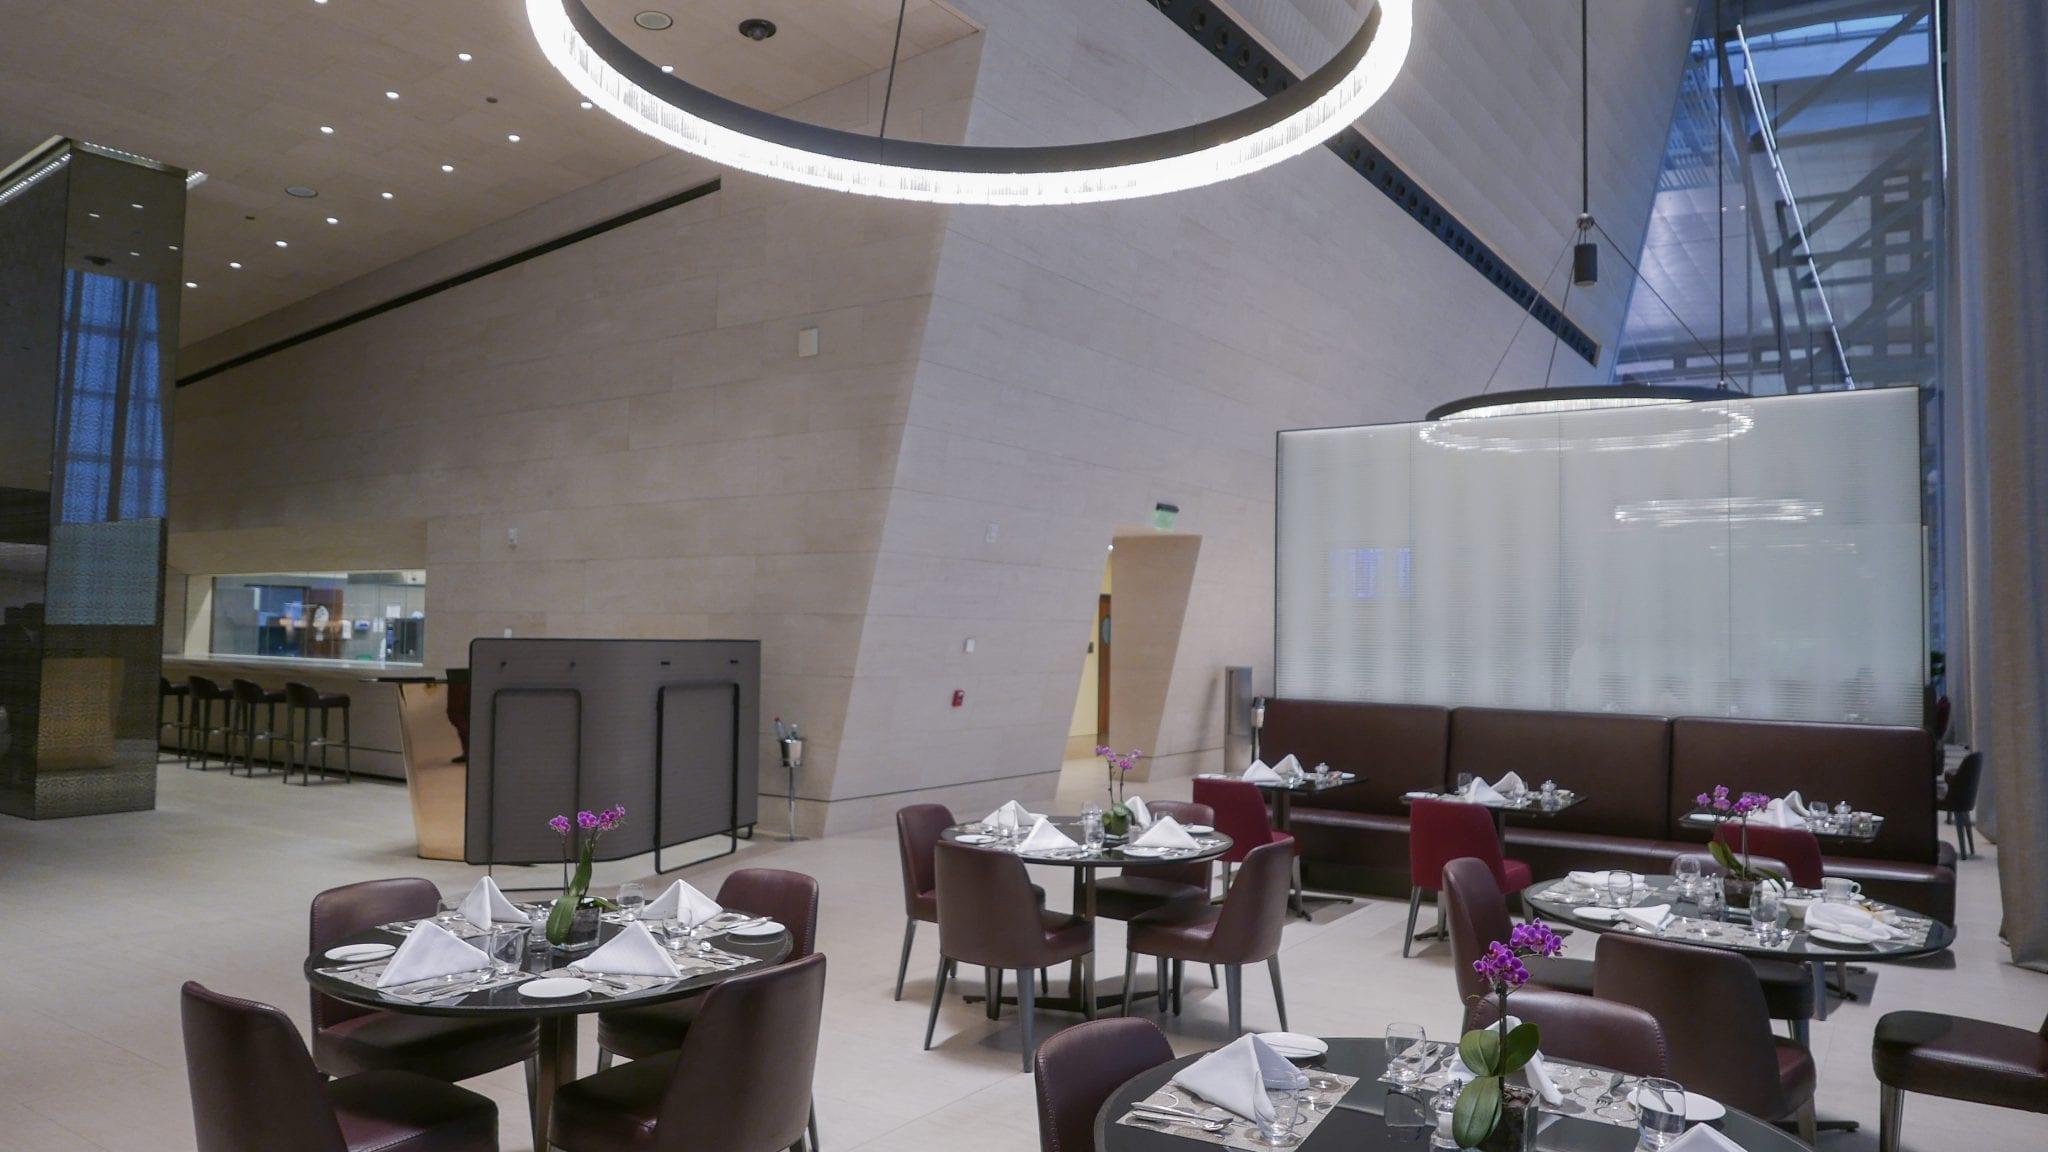 al safwa 7 - REVIEW - Qatar Al Safwa First Class Lounge - Doha